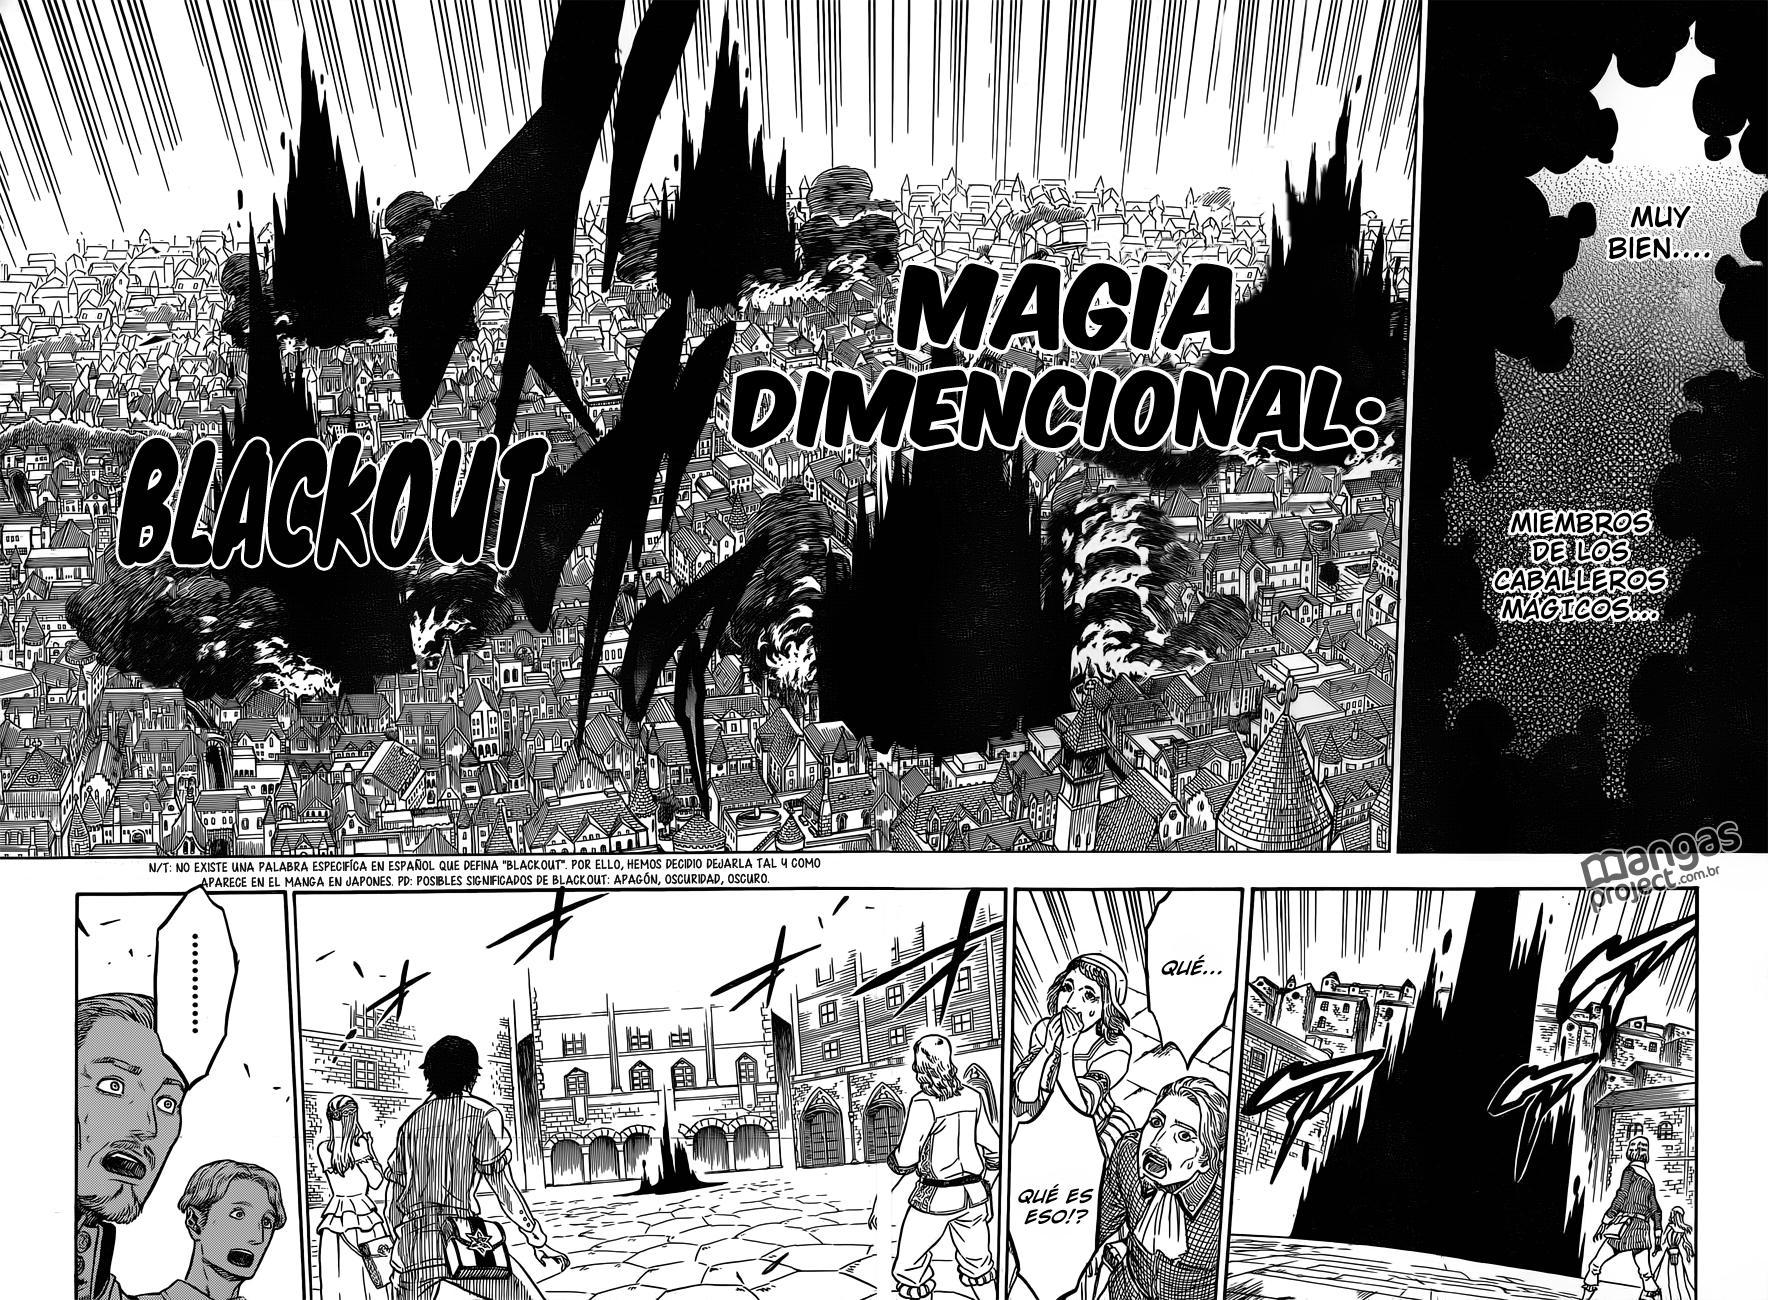 http://c5.ninemanga.com/es_manga/35/3811/416915/2576d27930d81b5421cb7c27c6807854.jpg Page 9